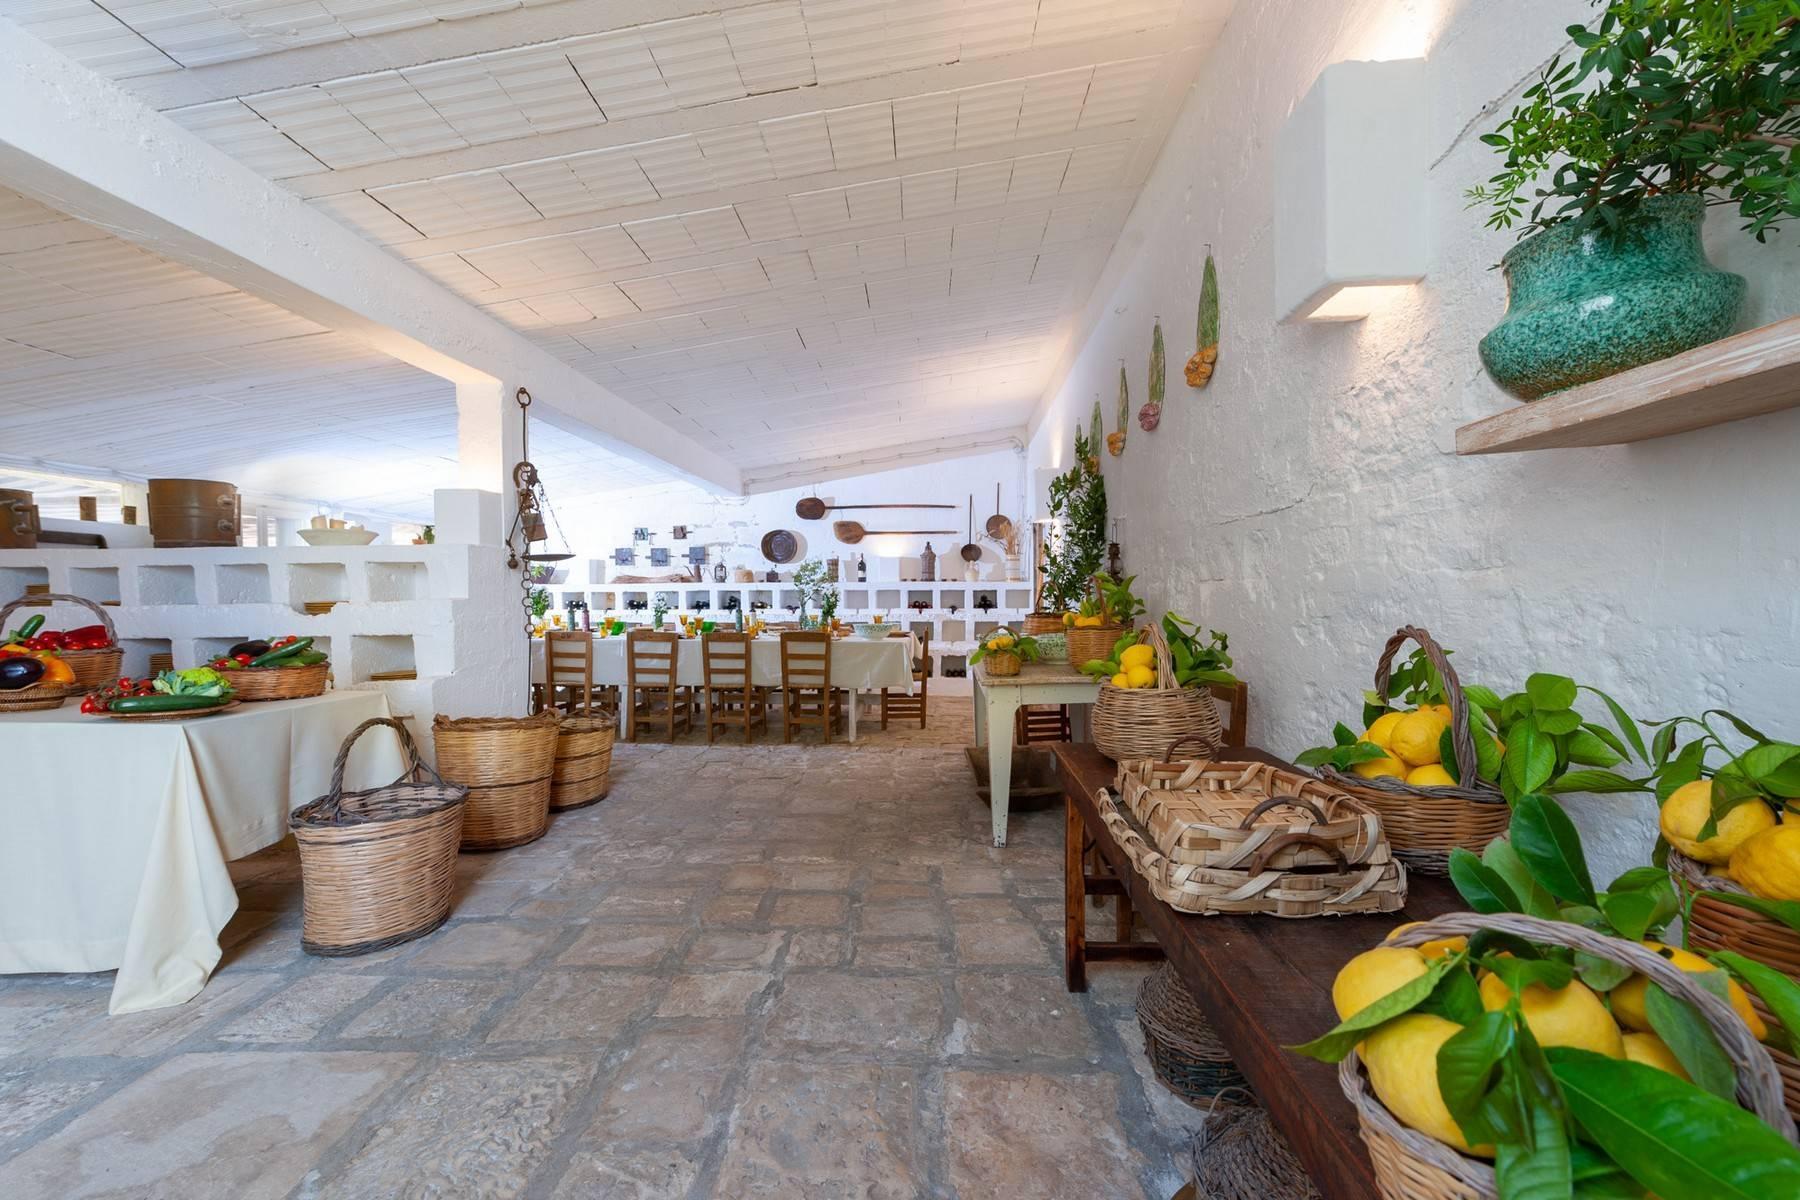 Splendida villa gentilizia del '600 circondata da agrumeti - 22